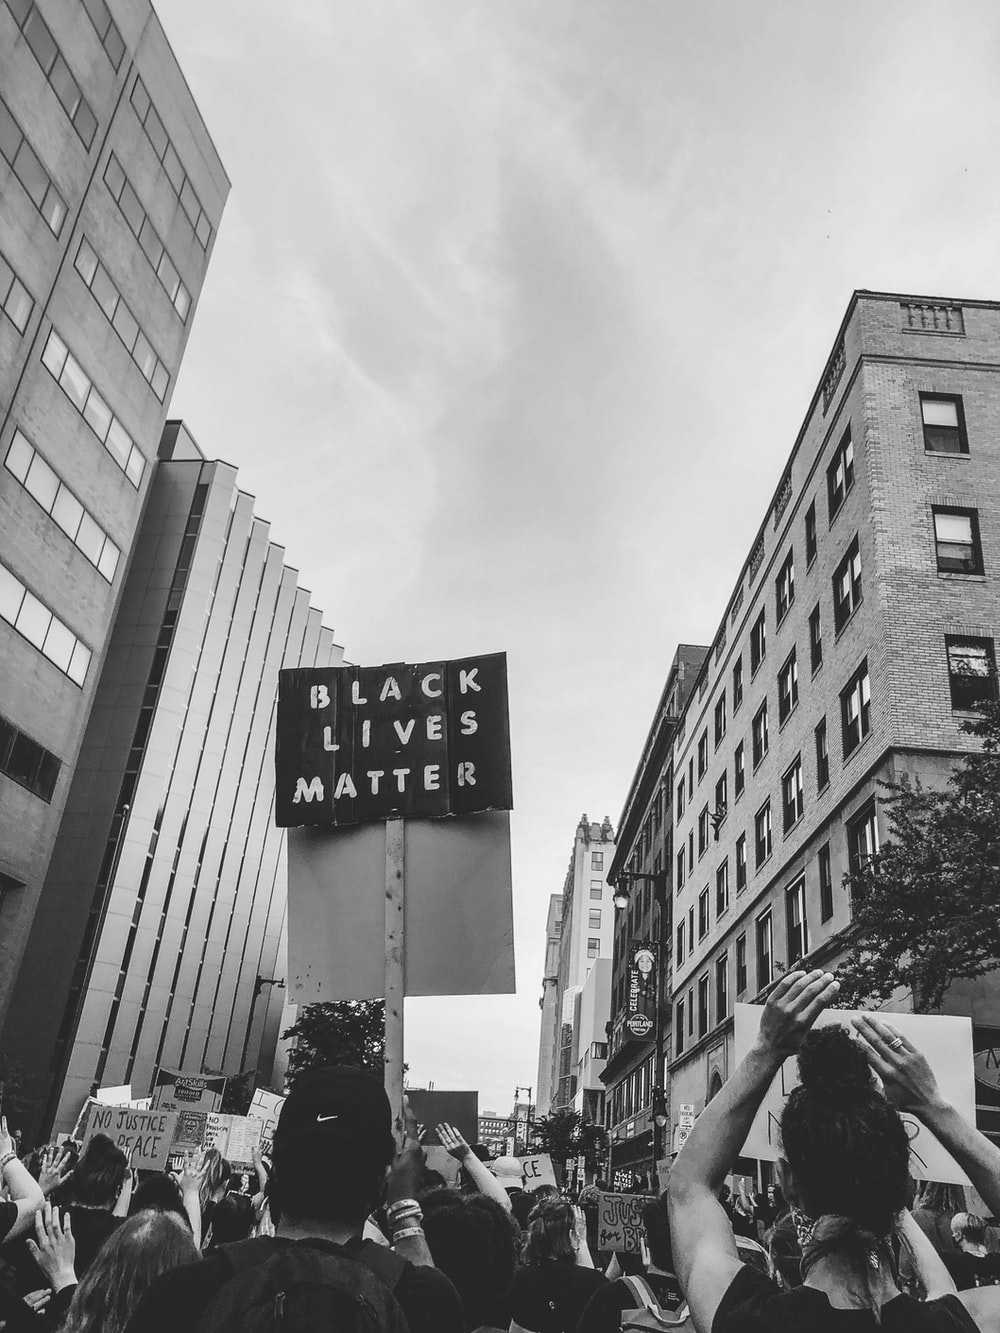 grayscale photo of man in black jacket and black pants walking on pedestrian lane